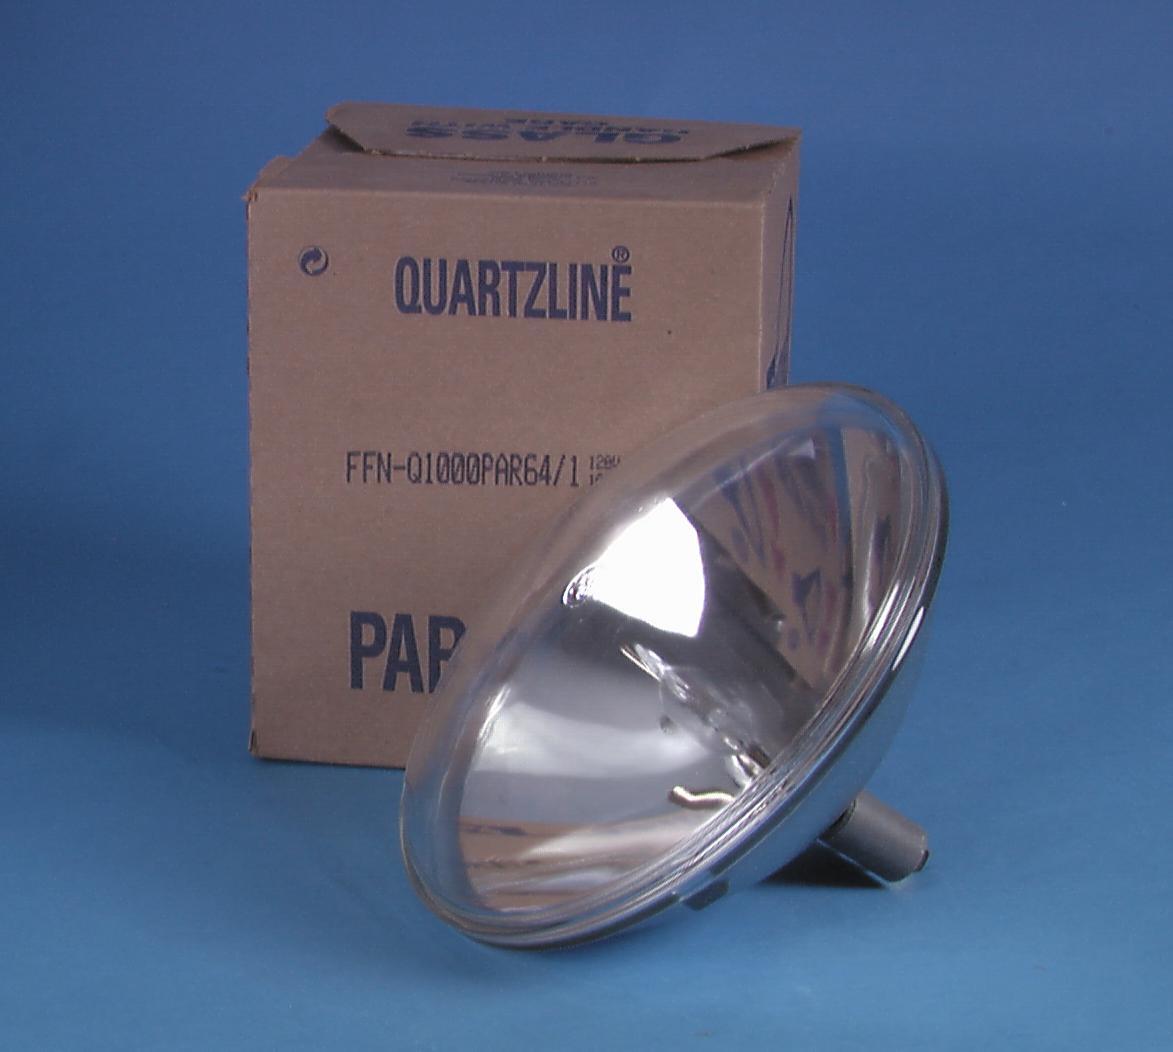 Lampada Faro GE FFN PAR-64 120V/1000W VNSP 800h 3200 K,